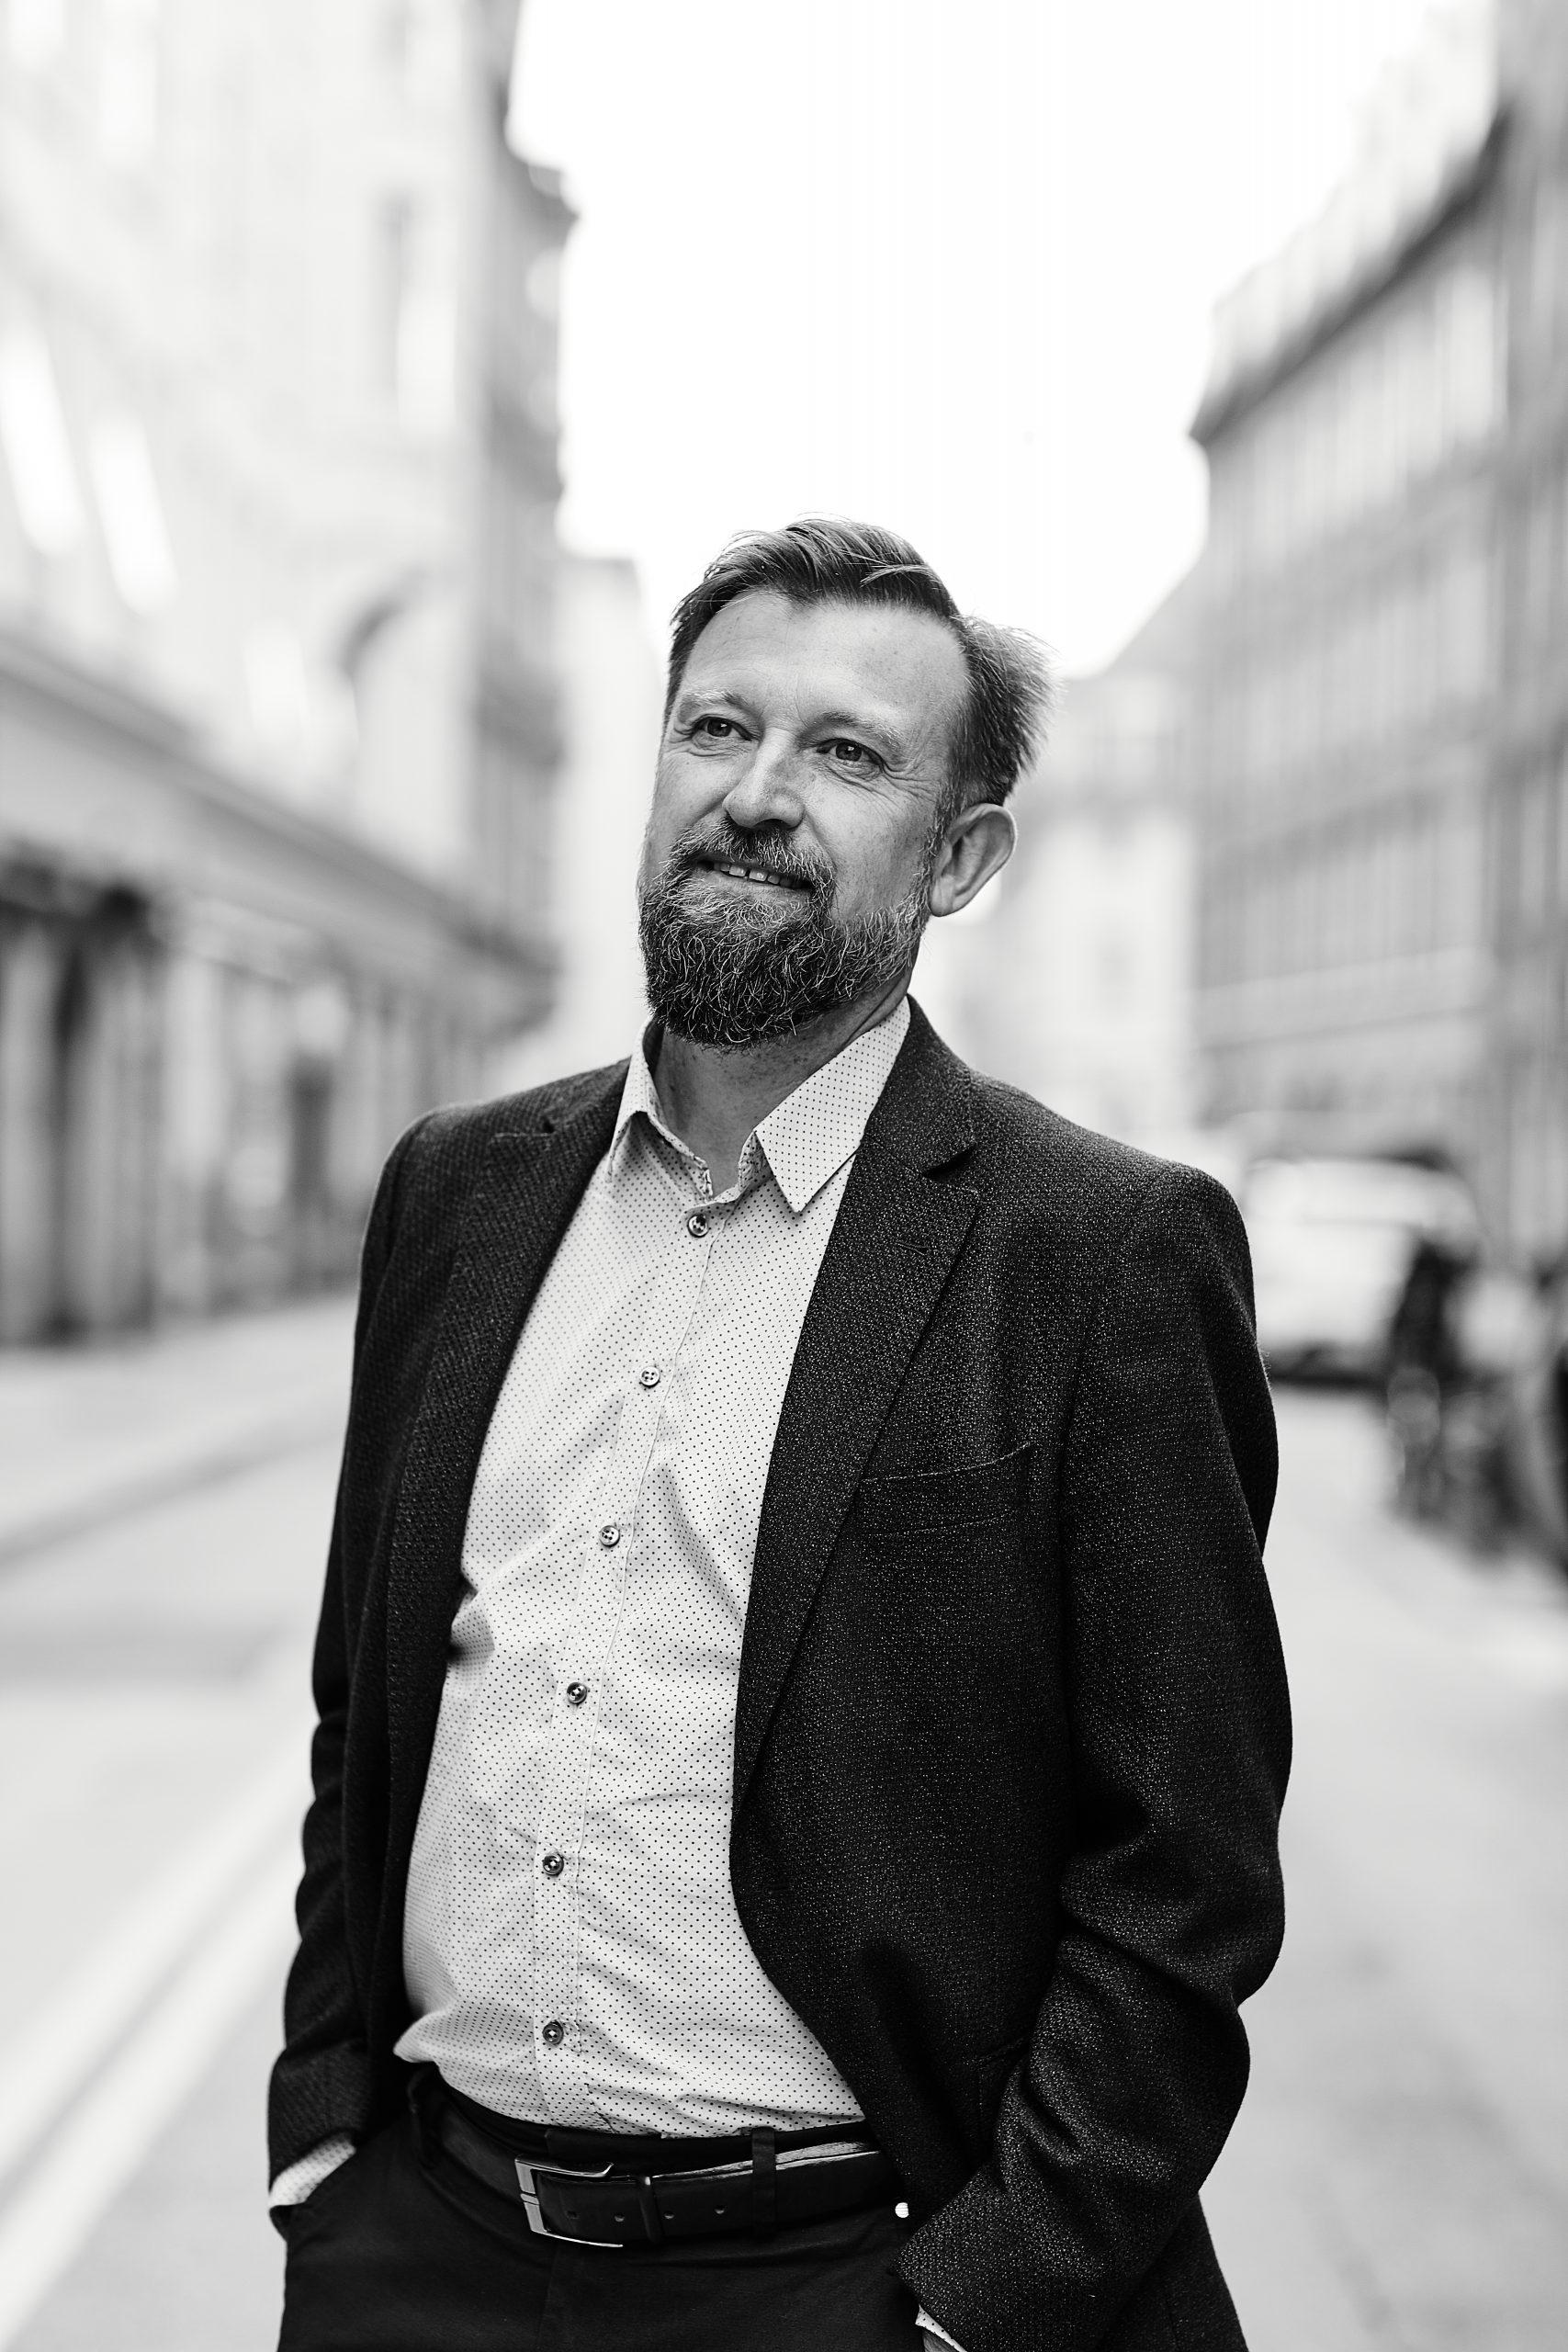 Søren Mikael Rasmussen